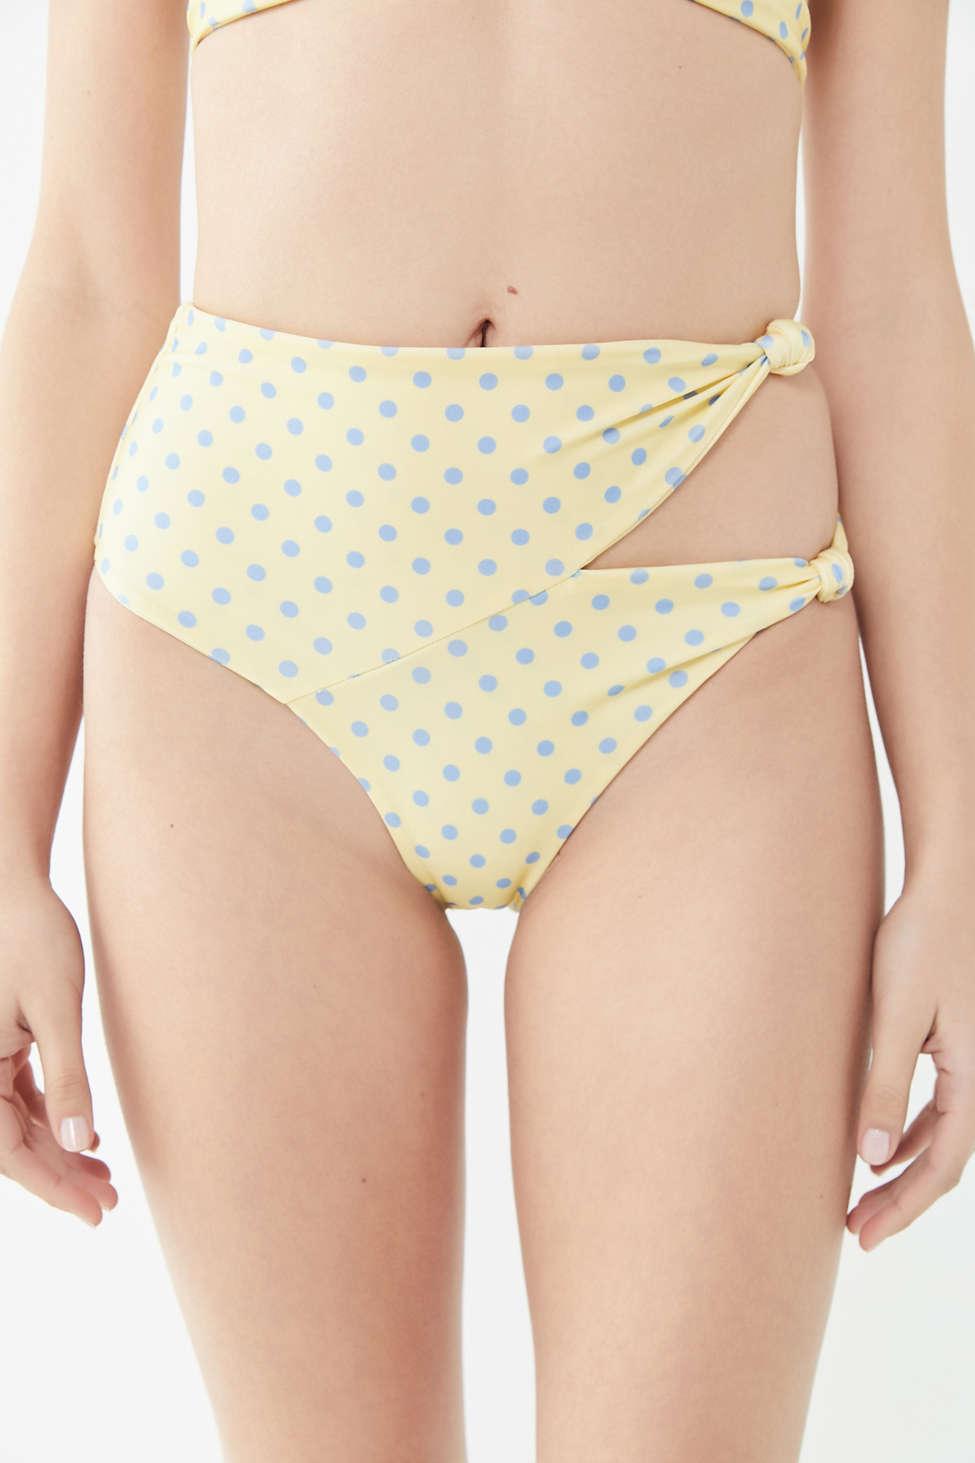 For Love & Lemons Limoncello Knotted High Waisted Bikini Bottom by For Love &Amp; Lemons